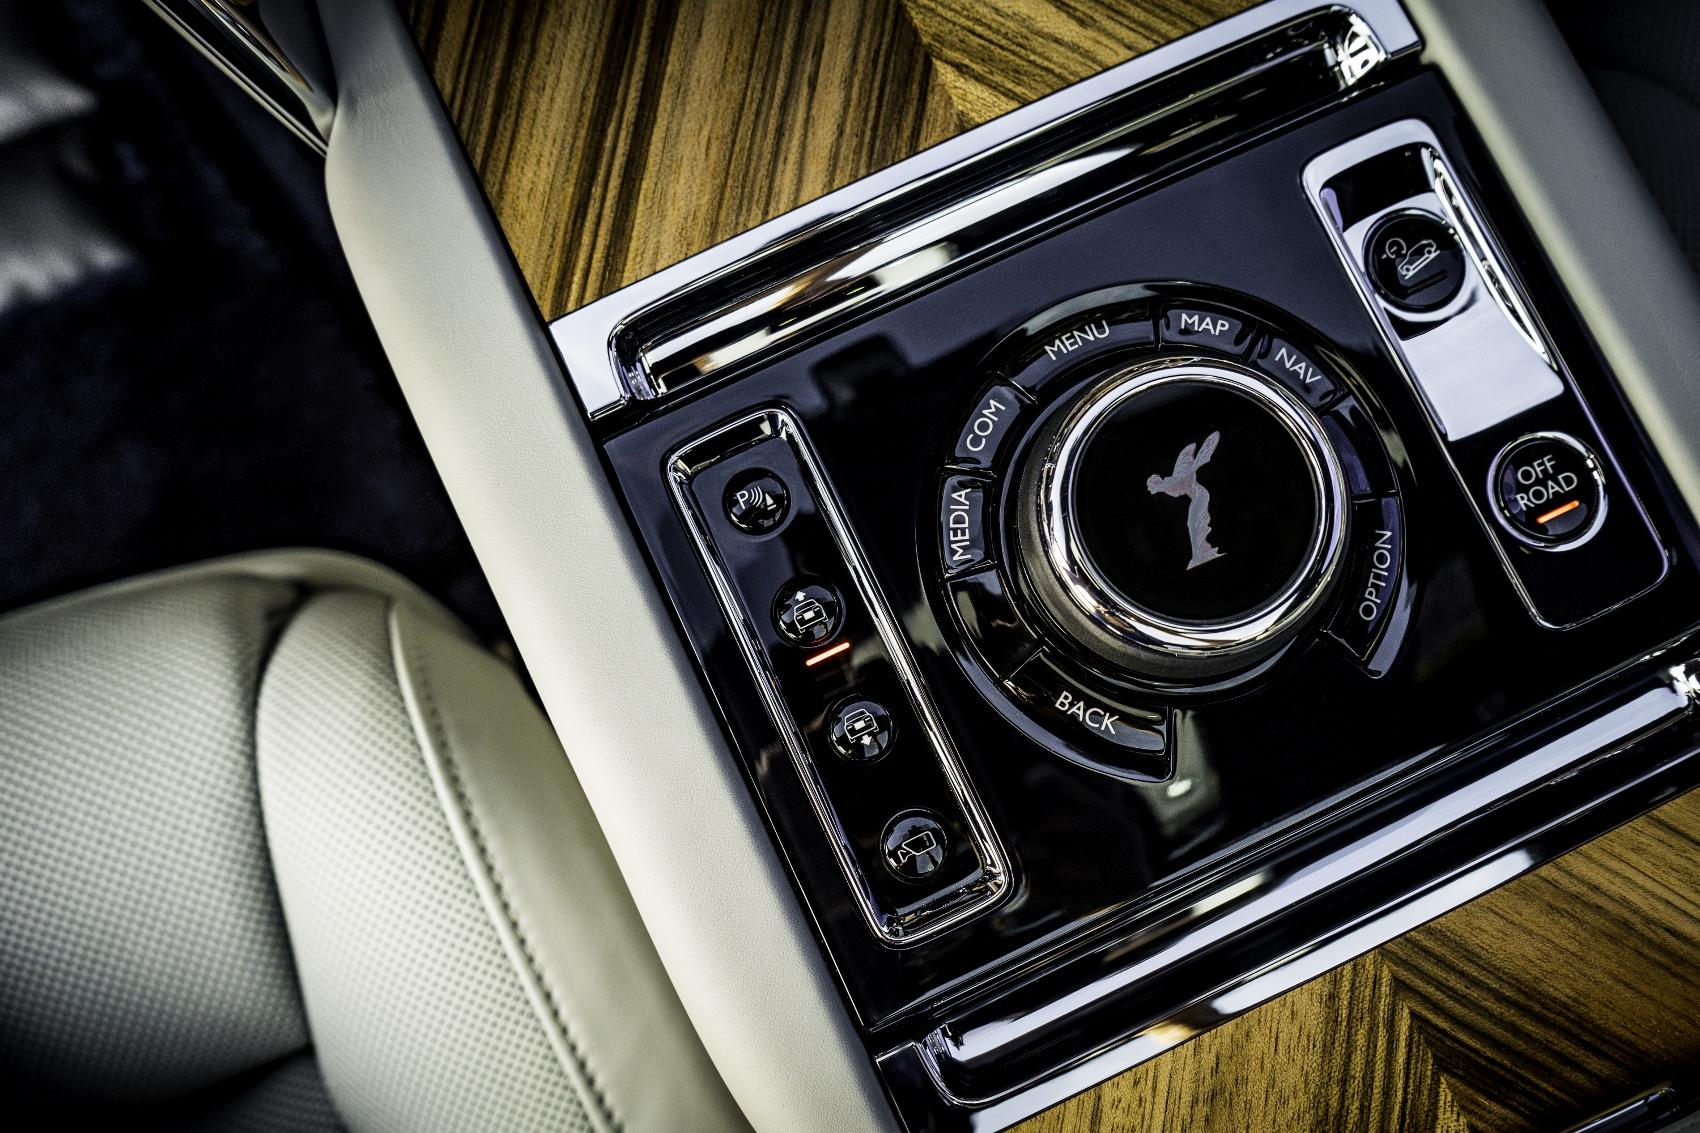 Rolls Royce Cullinan sa predviedol na púšti. Pozrite si foto aj video AOjiUrN5Q0 rolls-royce-cullina